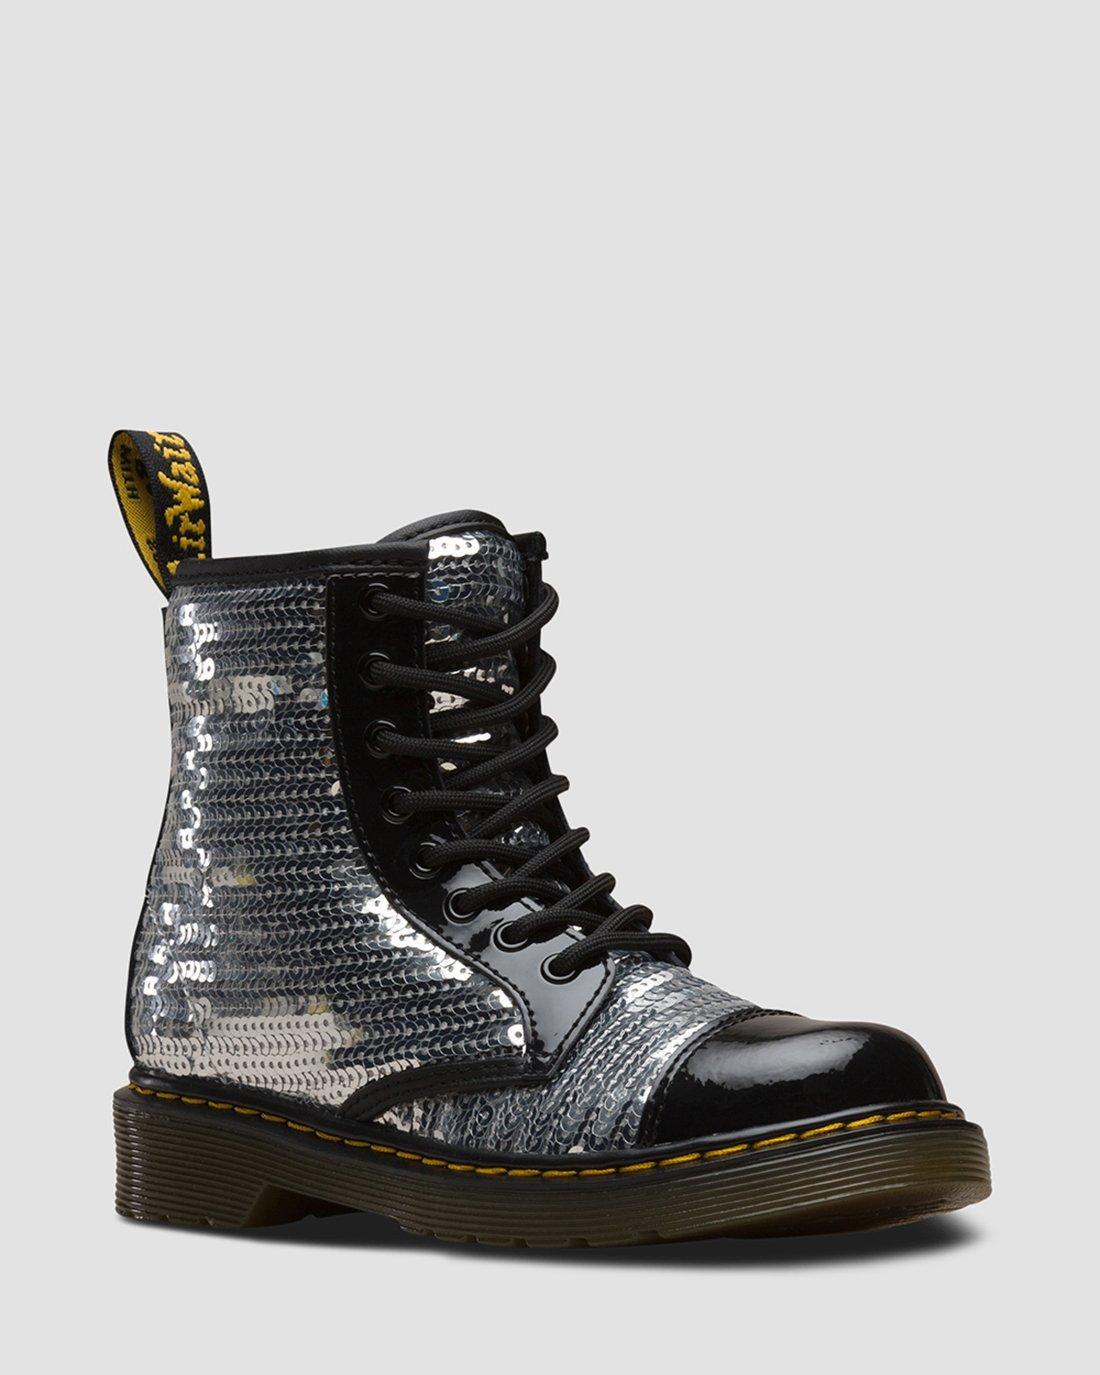 1460 Pooch Sequin junior | Chaussures en cuir verni | Boots